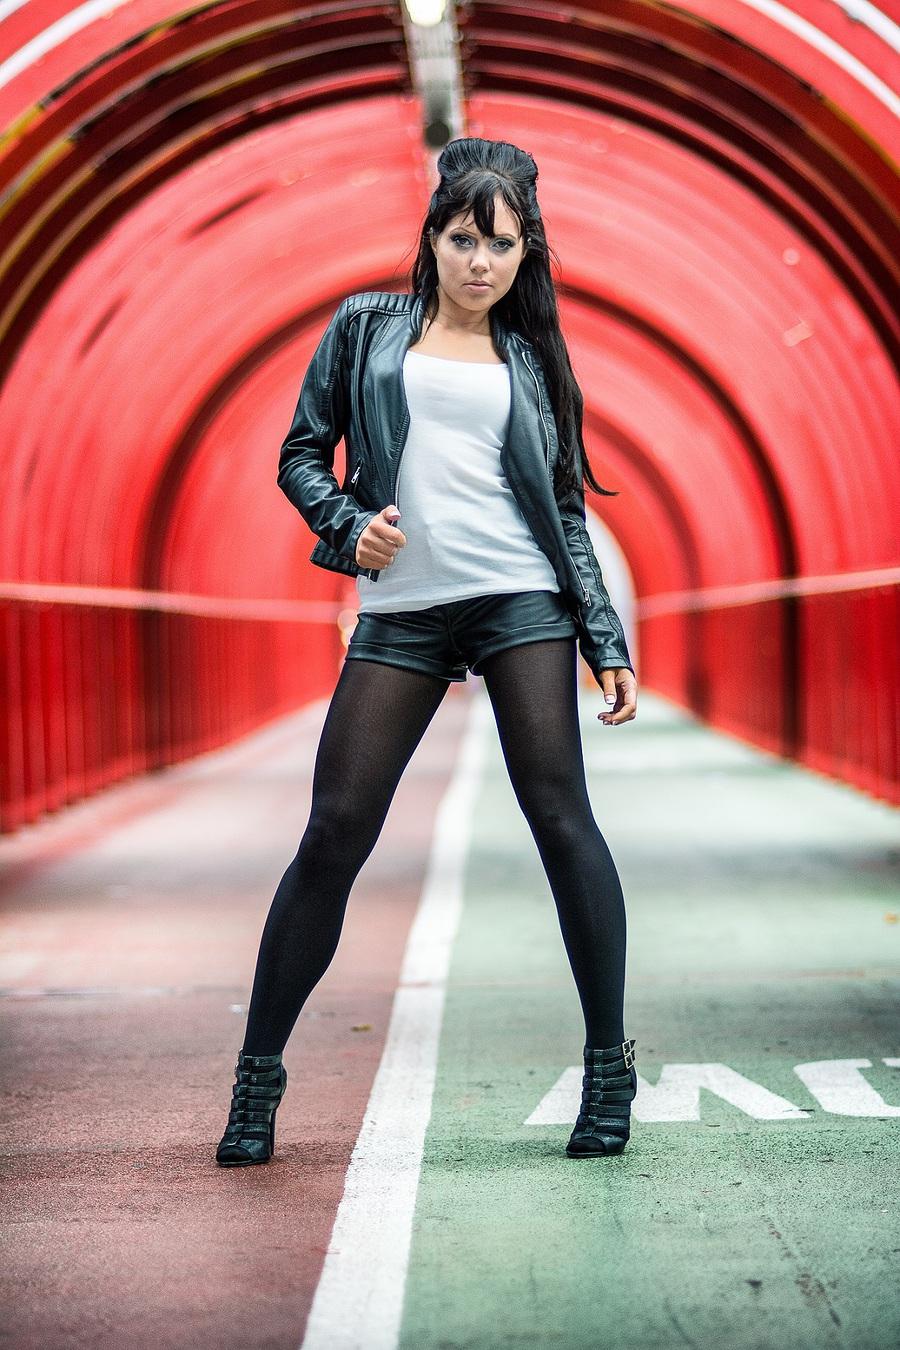 Tunnel Fashion / Model Jen_981 / Uploaded 15th August 2016 @ 04:56 PM